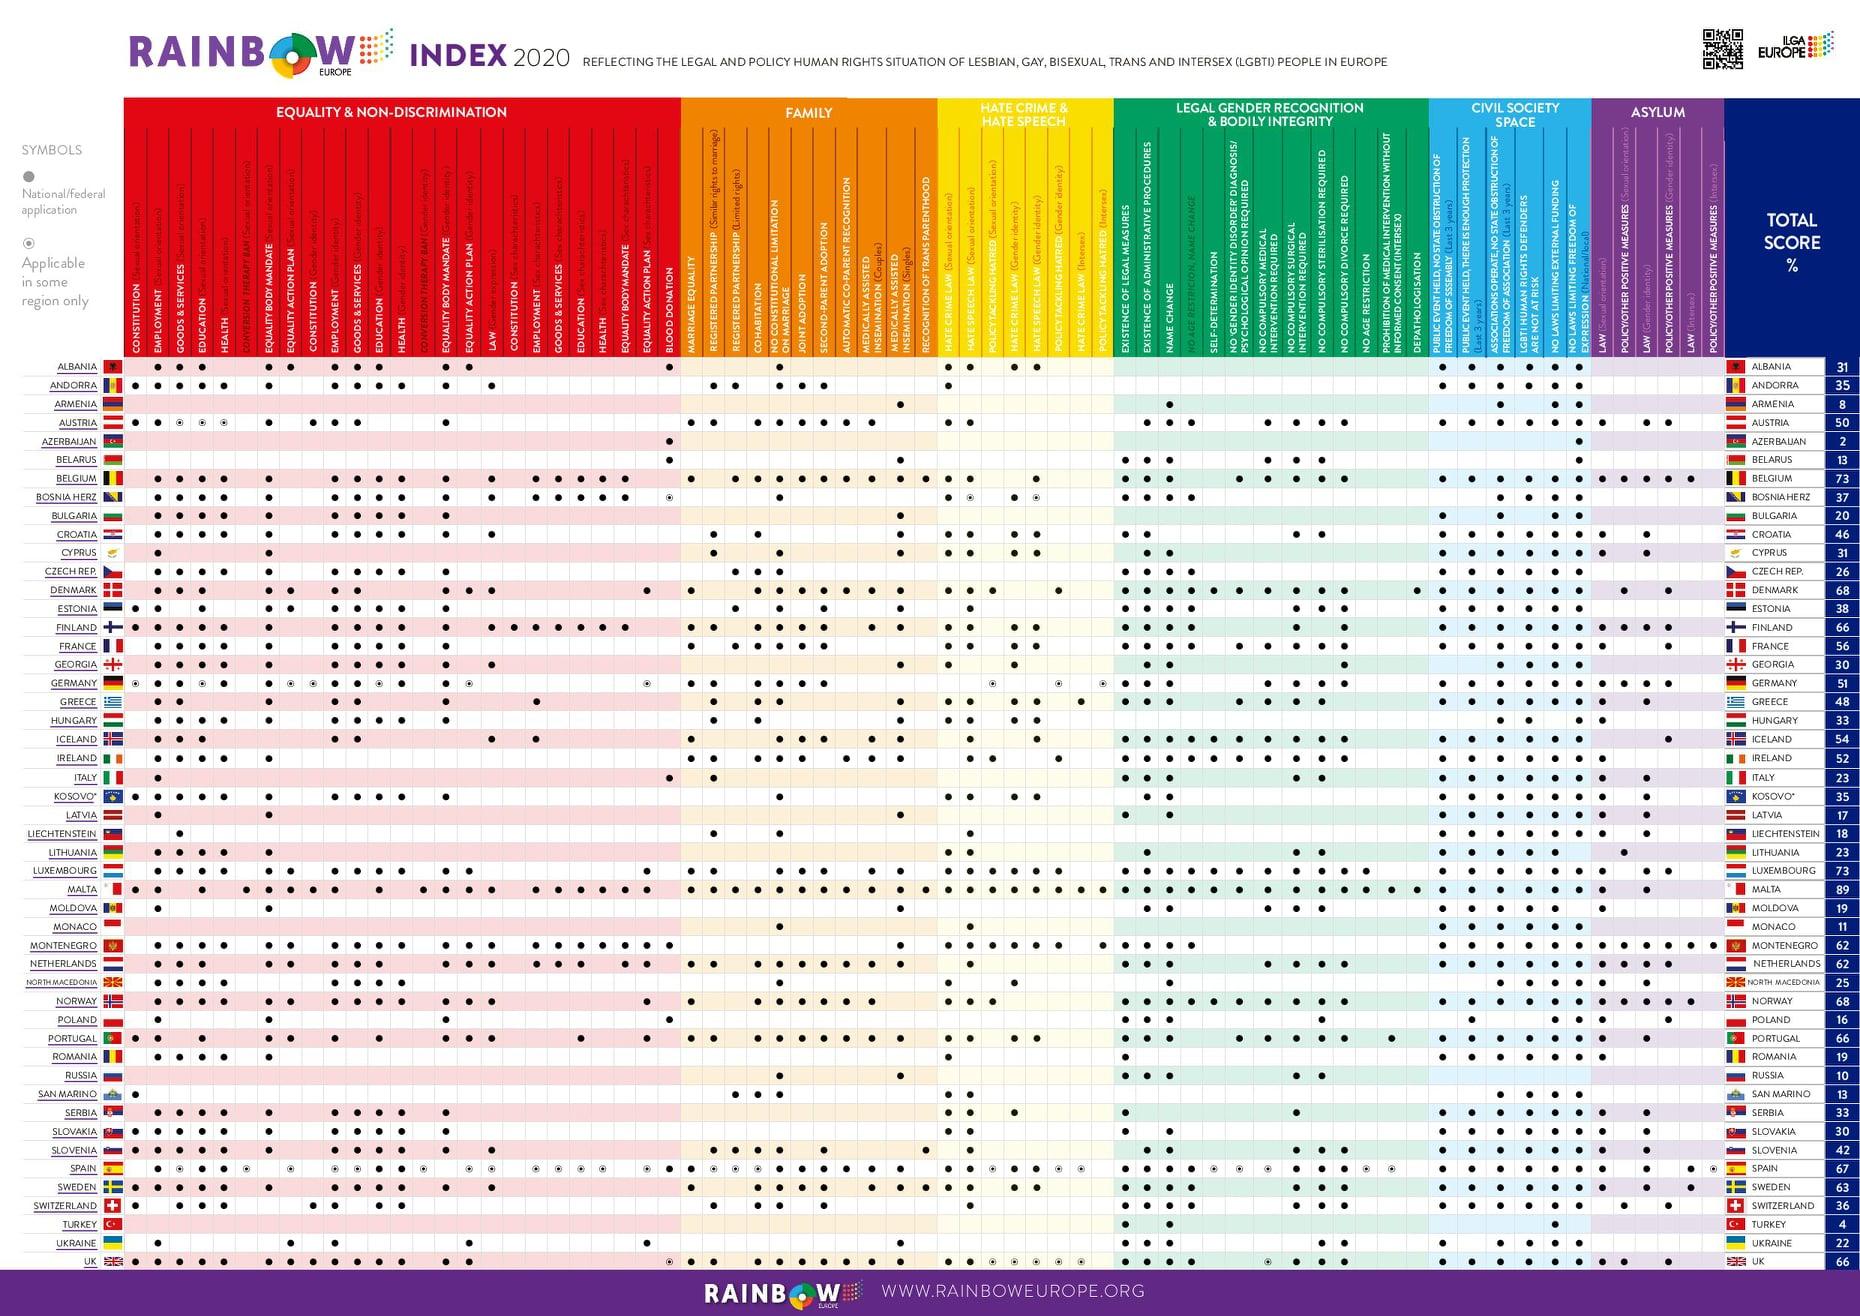 ILGA-EUROPE Rainbow Map